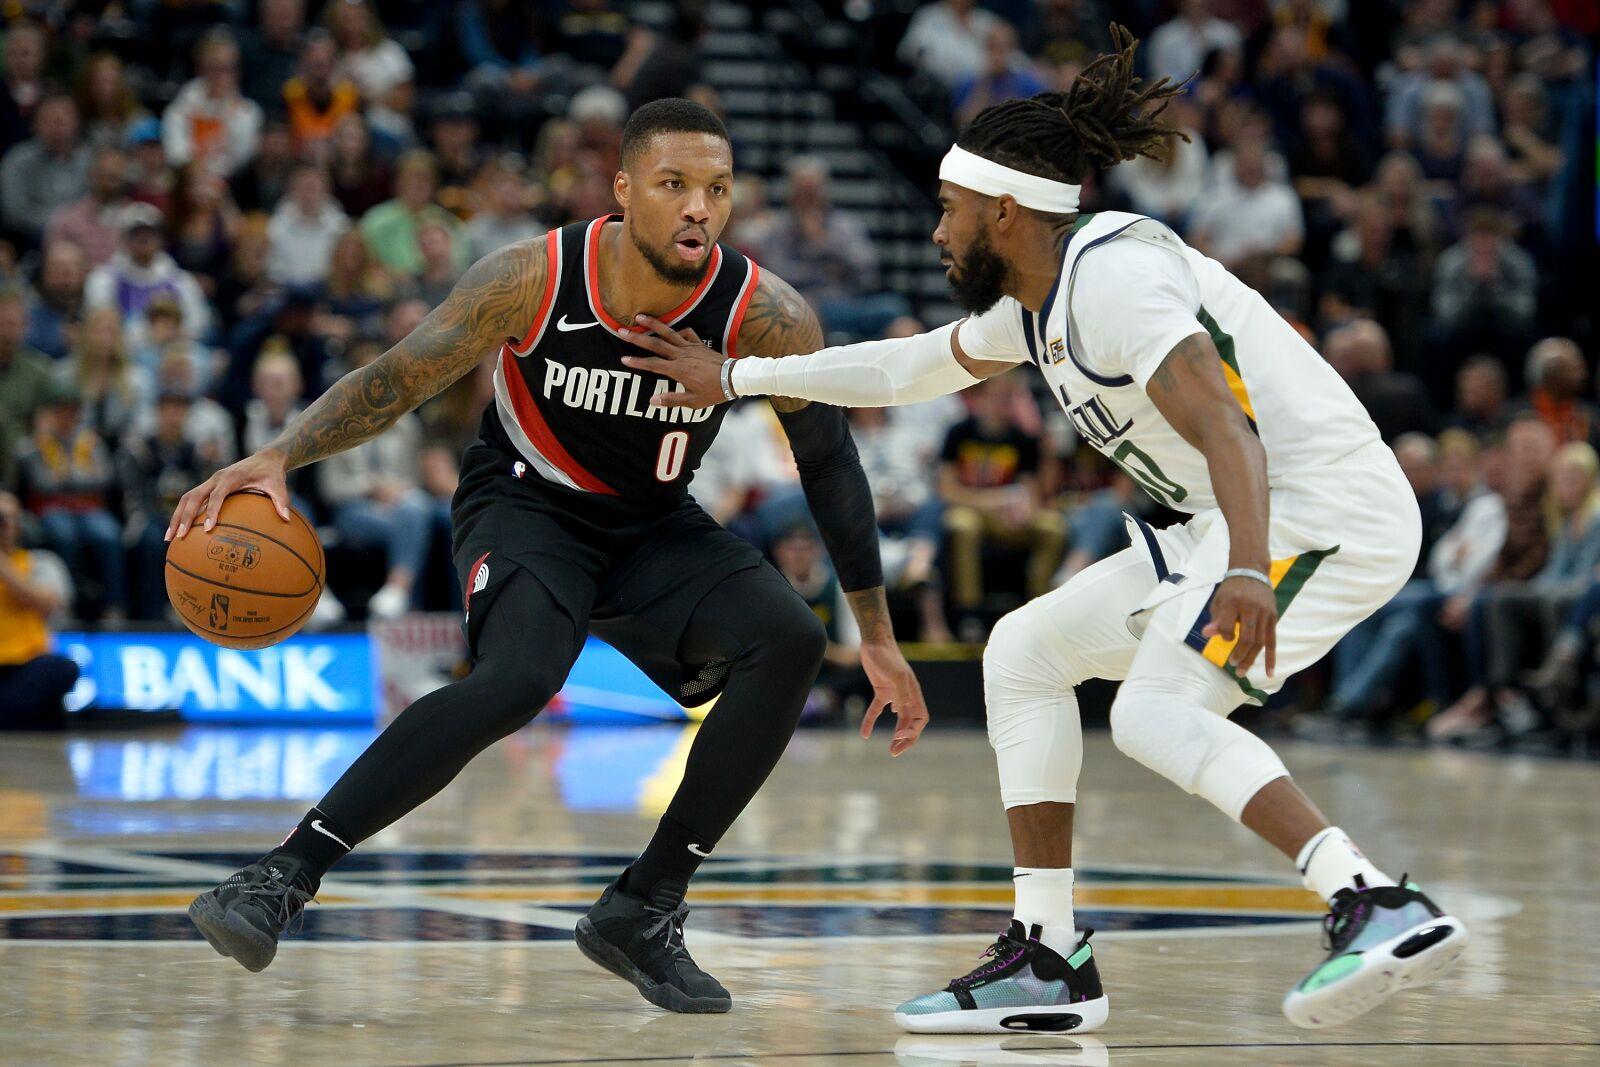 Portland Trail Blazers at Utah Jazz: Post-game analysis